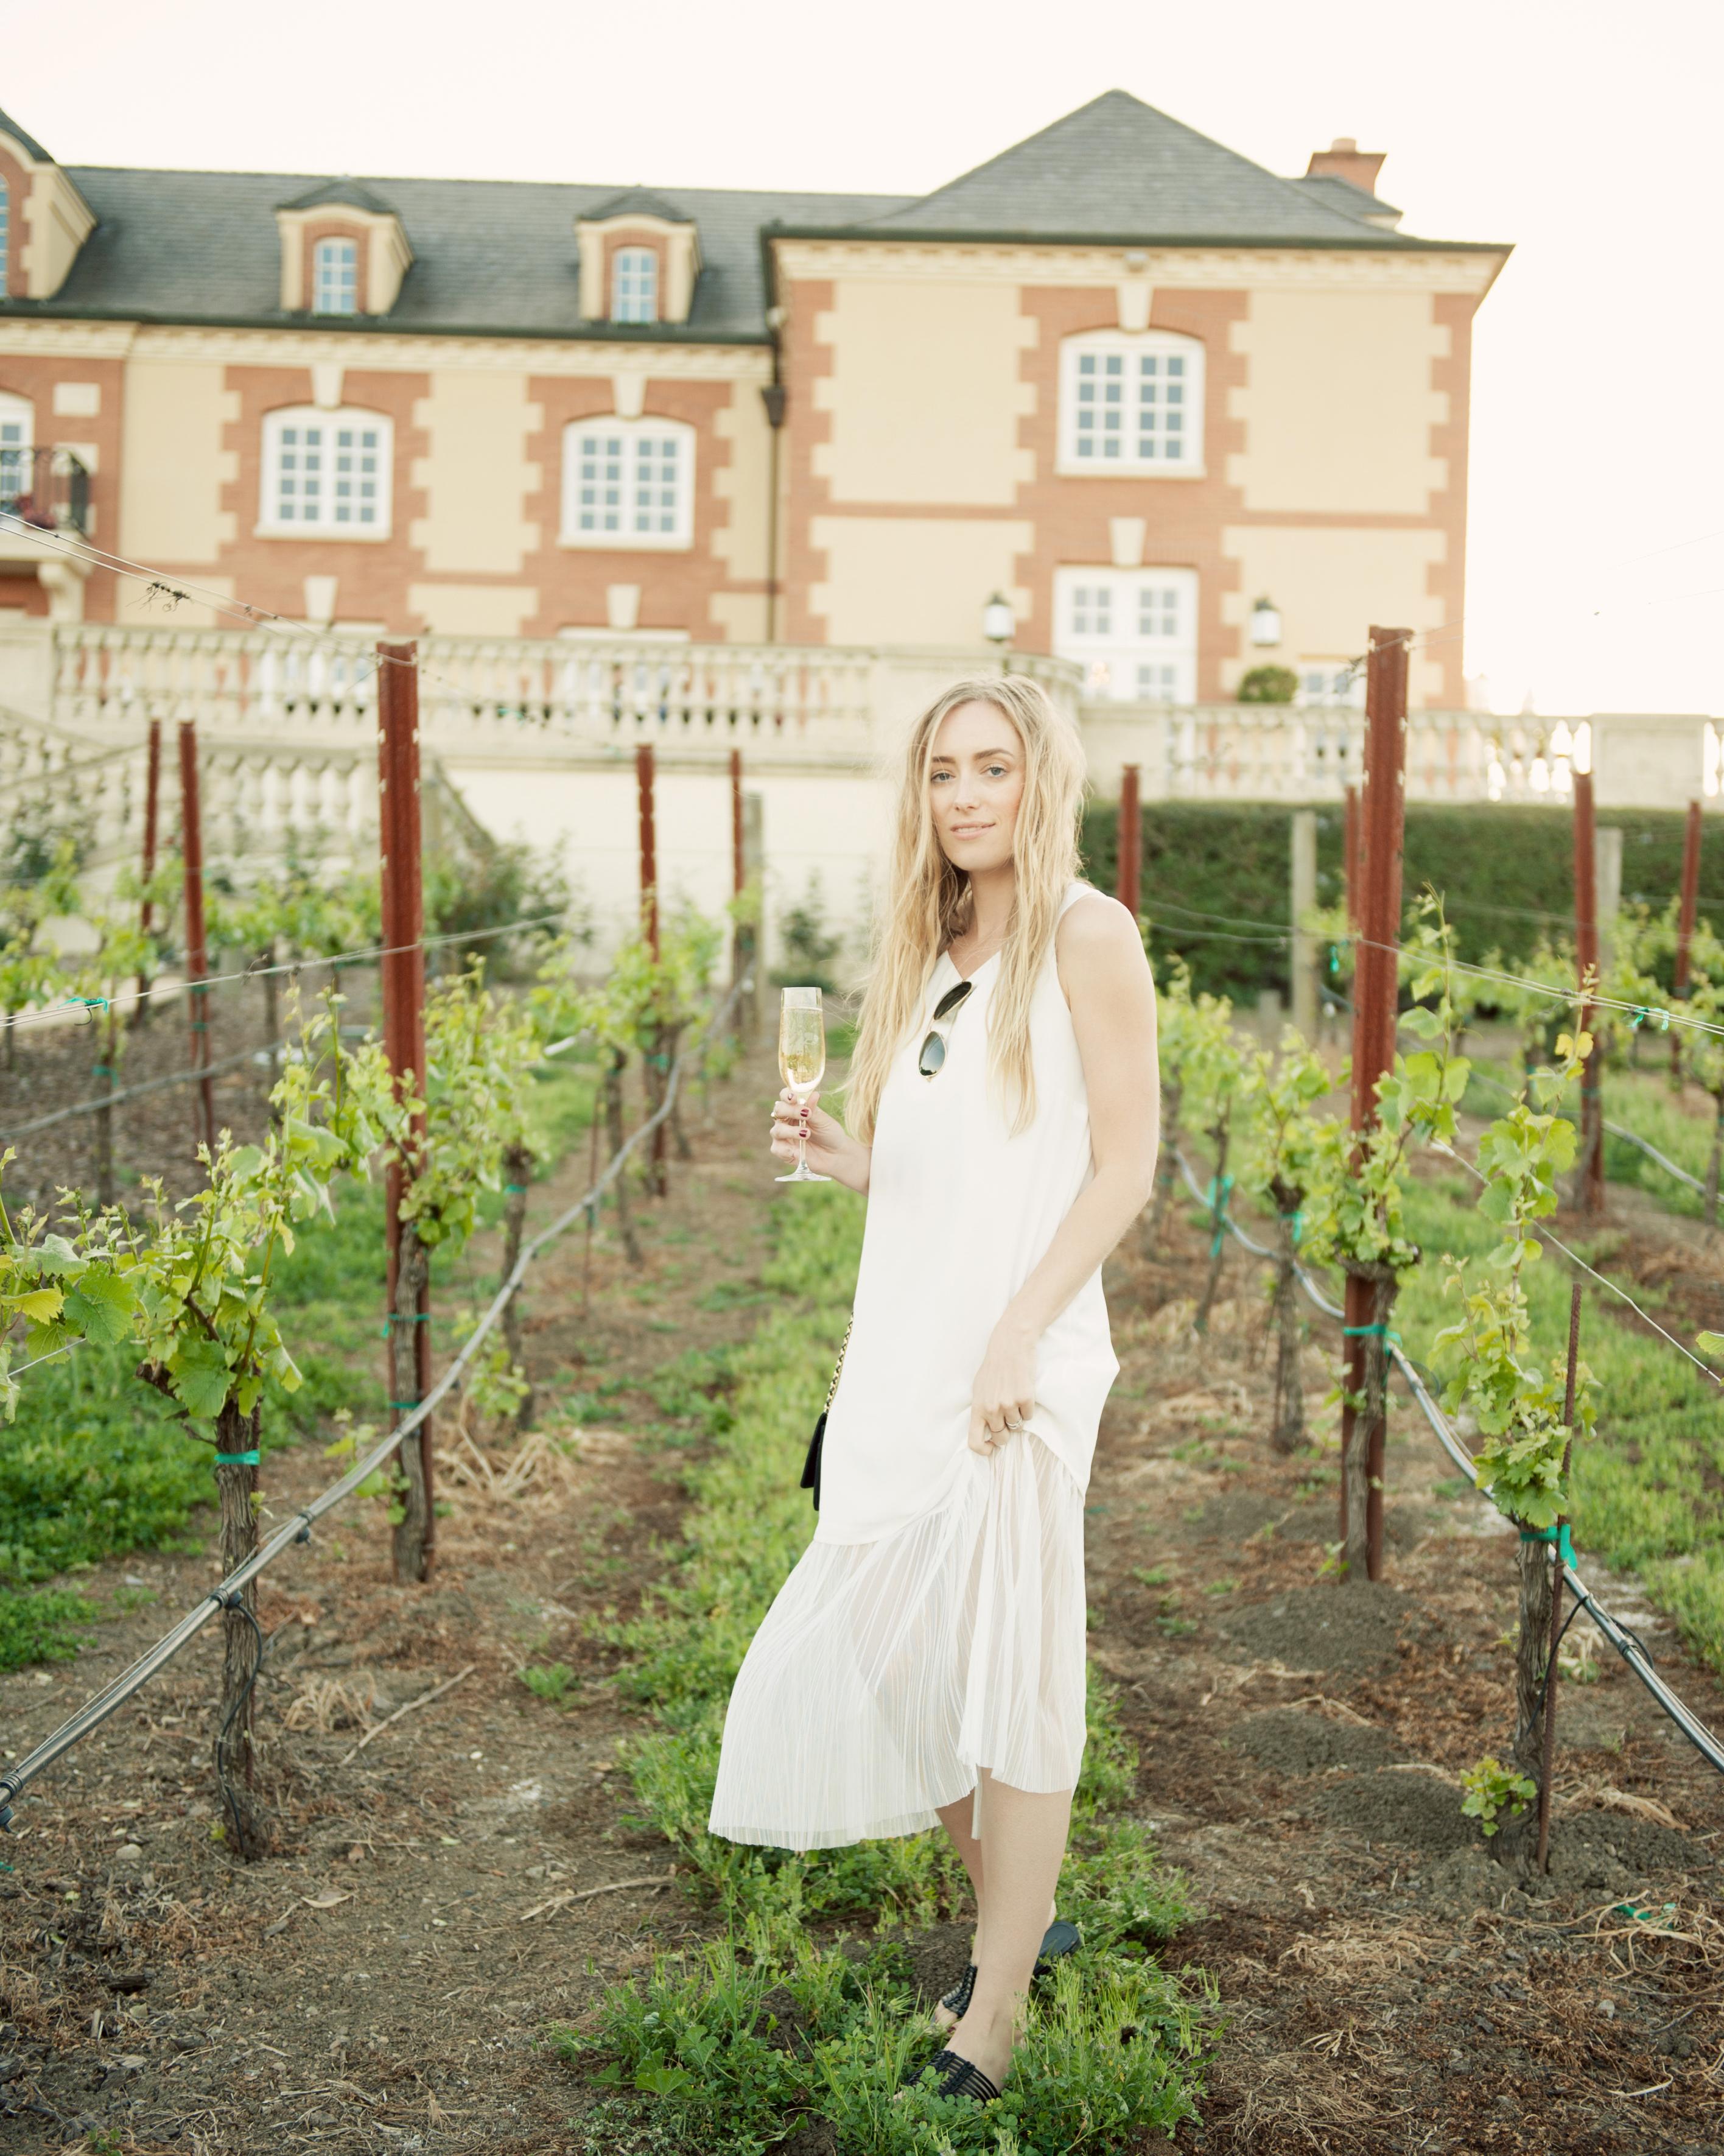 eatsleepwear-napa-valley-bachelorette-party-kimberly-pesch-vineyard-0415.jpg